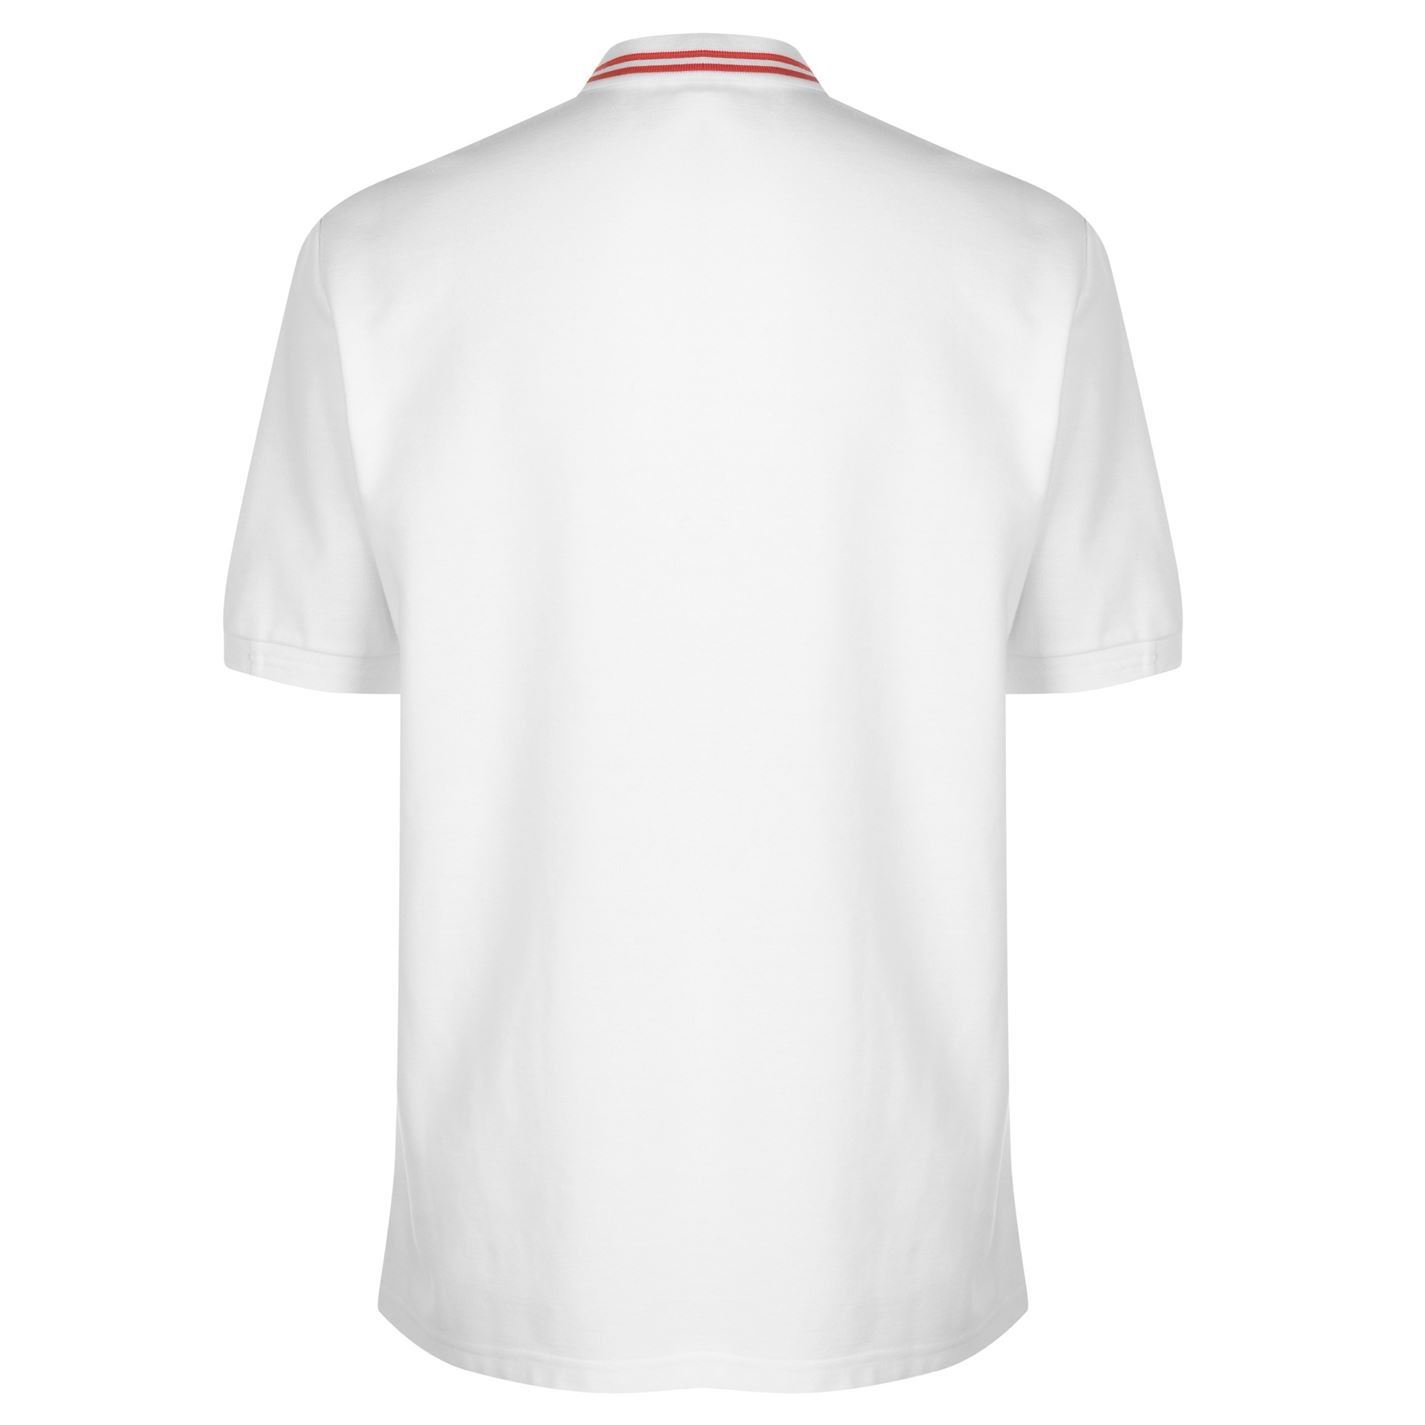 miniature 9 - FIFA Coupe du monde 2018 Angleterre Polo Shirt Homme Football Soccer Top T-Shirt Tee